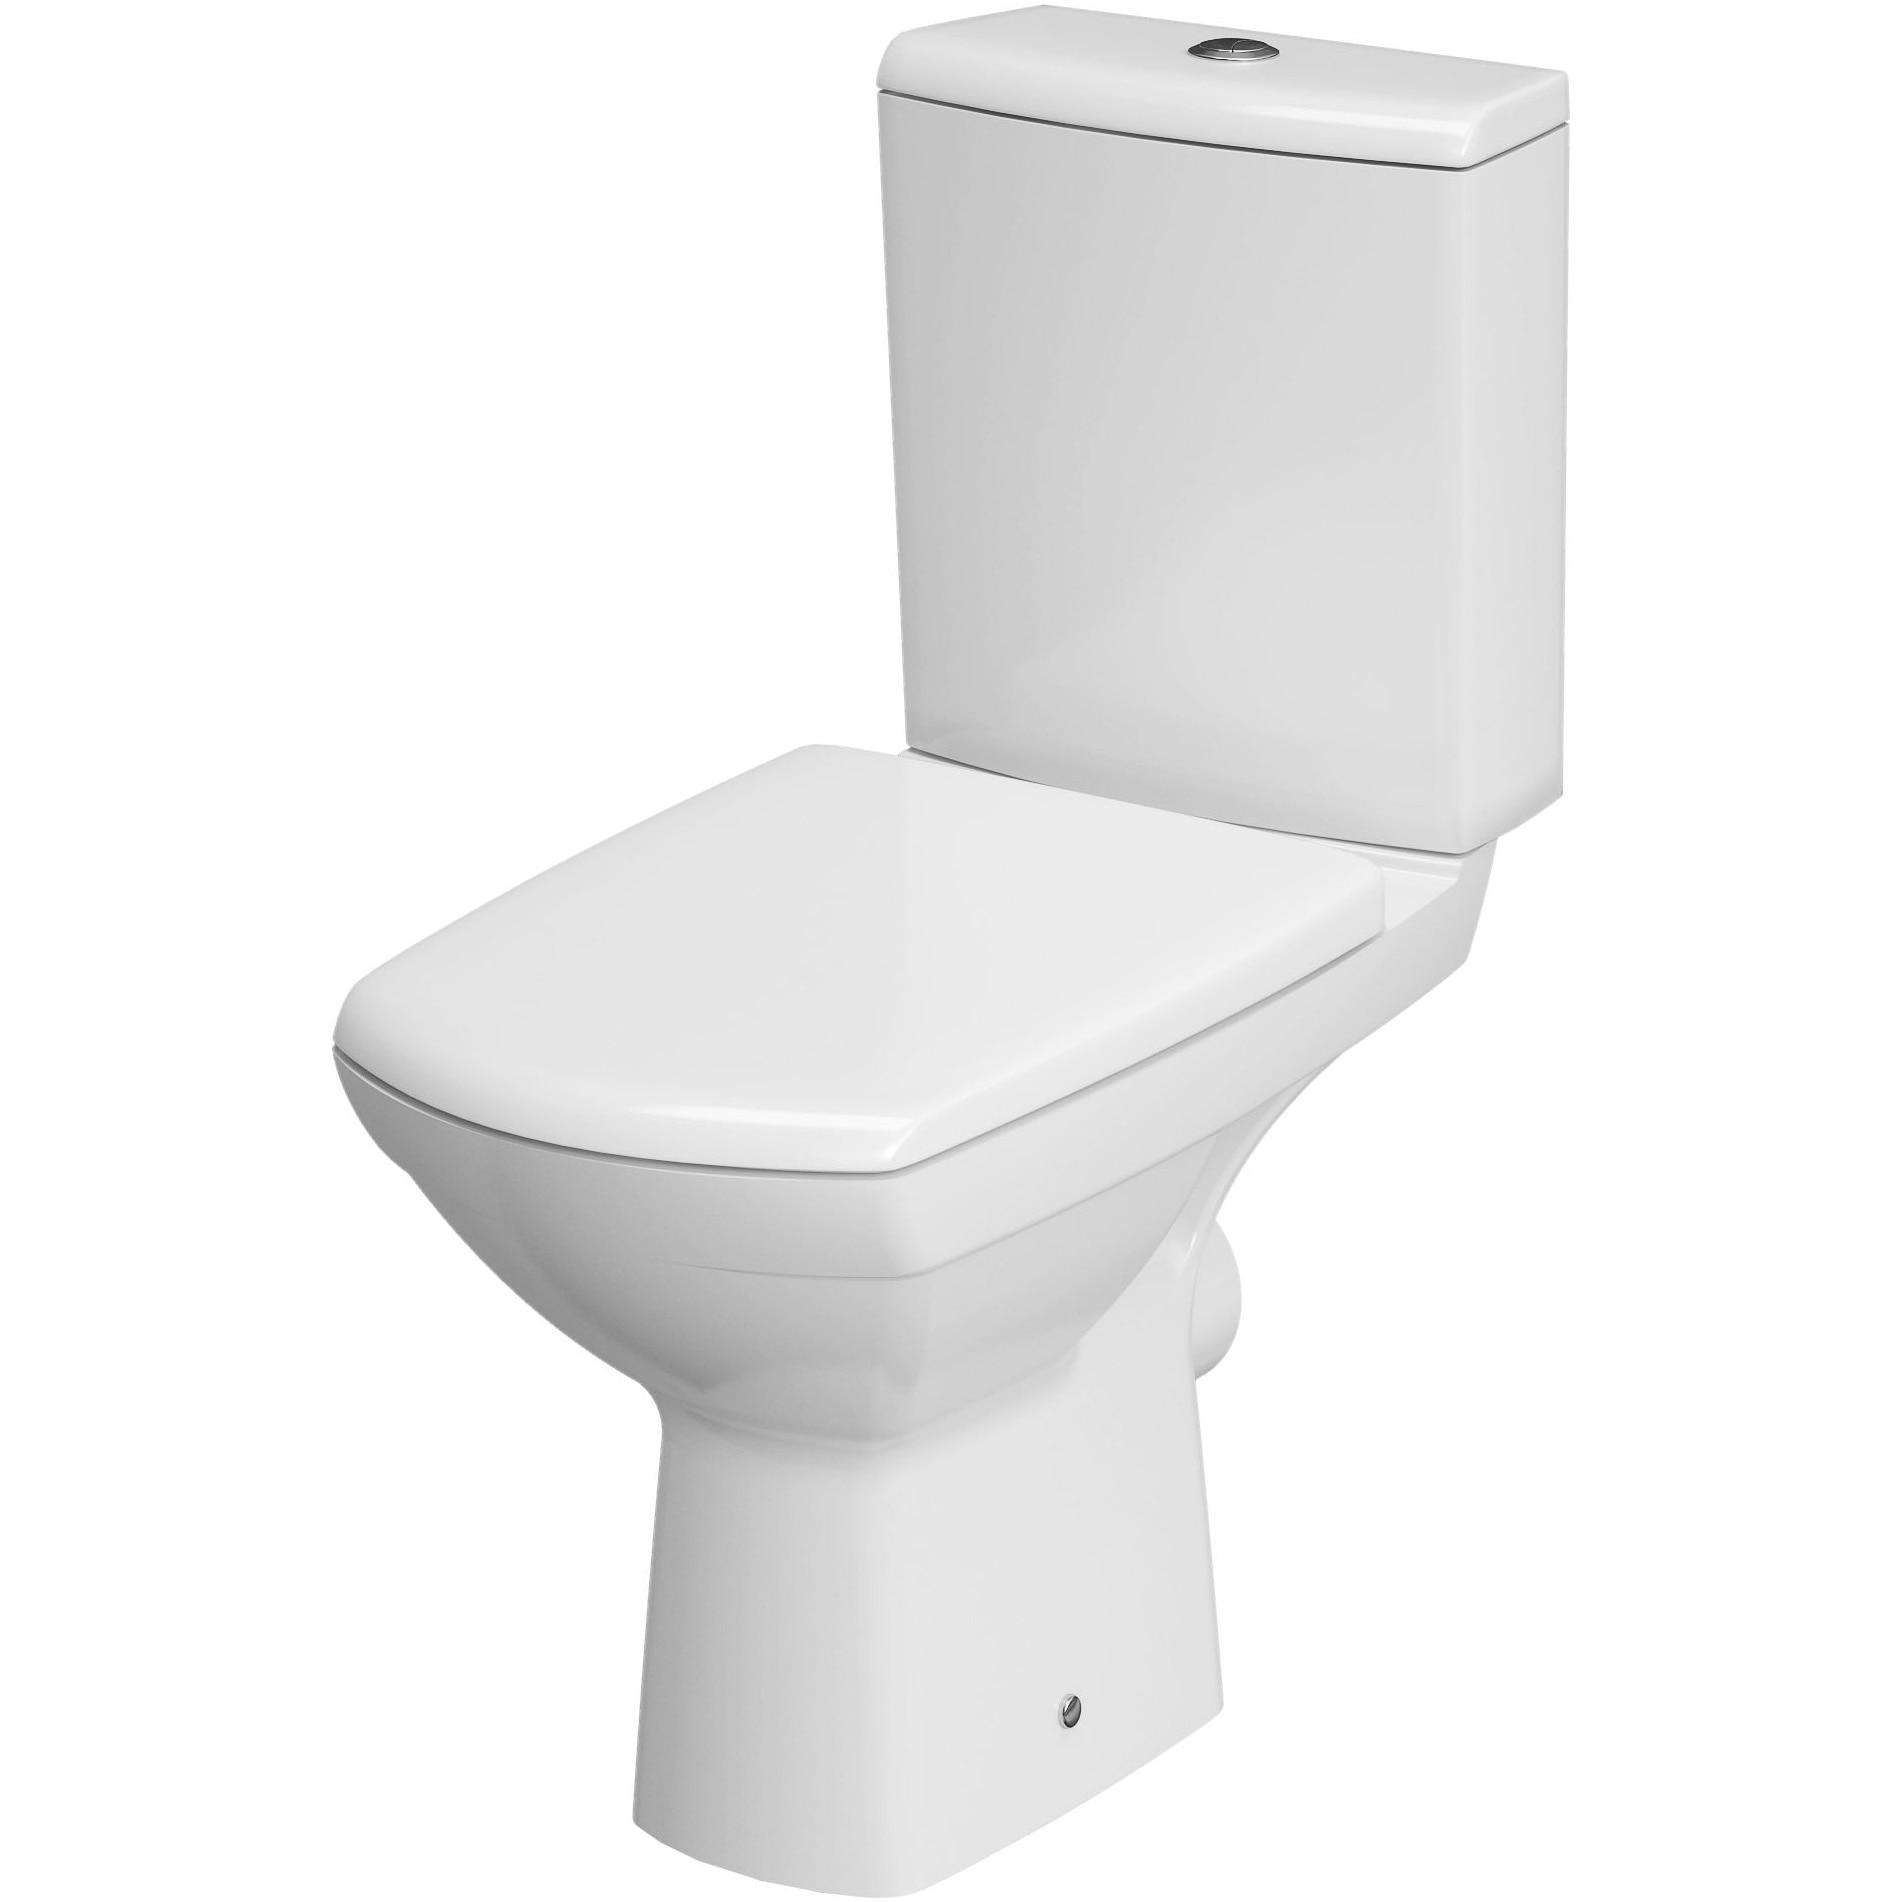 Fotografie Pachet vas WC Cersanit RR100-001 643 Viva + rezervor, Clean On, evacuare orizontala, capac WC Duroplast, inchidere lenta, demontare rapida